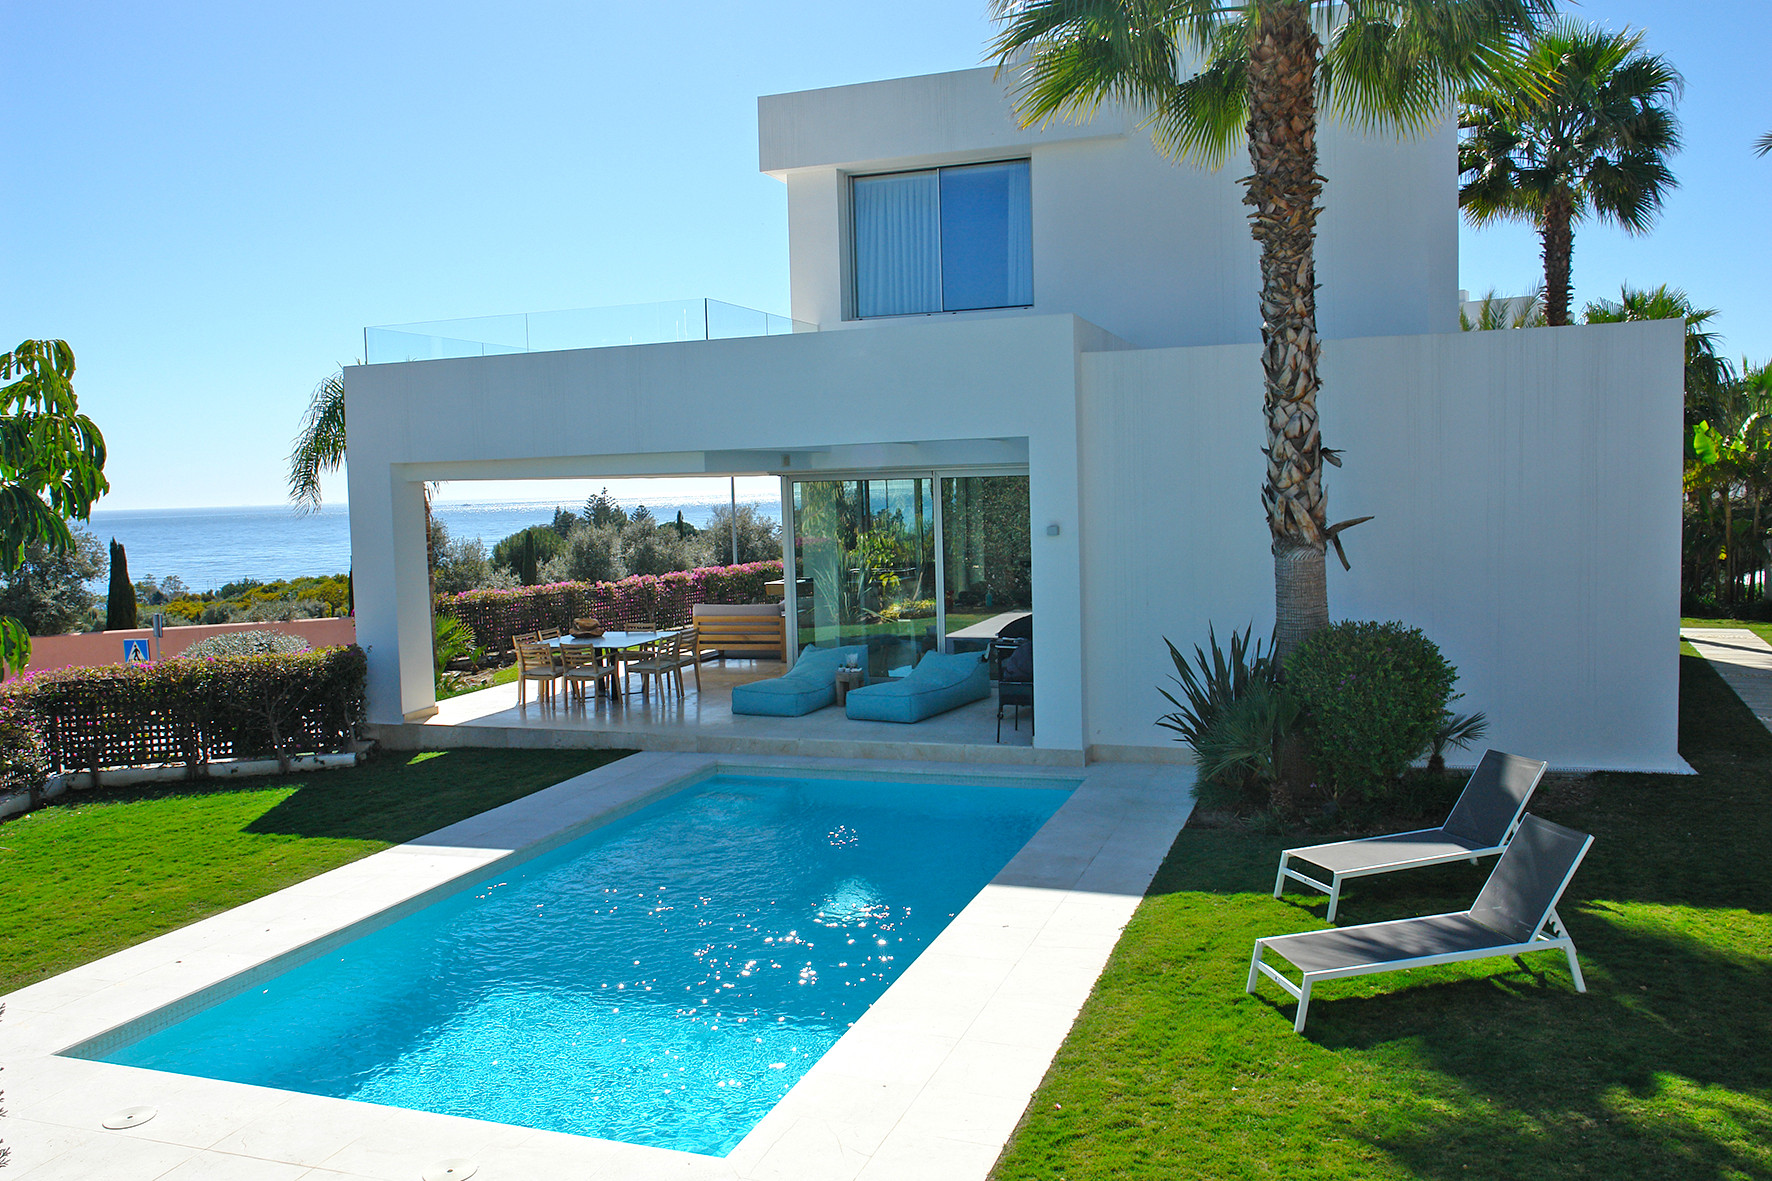 ARFV2157 - Neue modere V zum Verkauf in La Finca de Marbella, Marbella